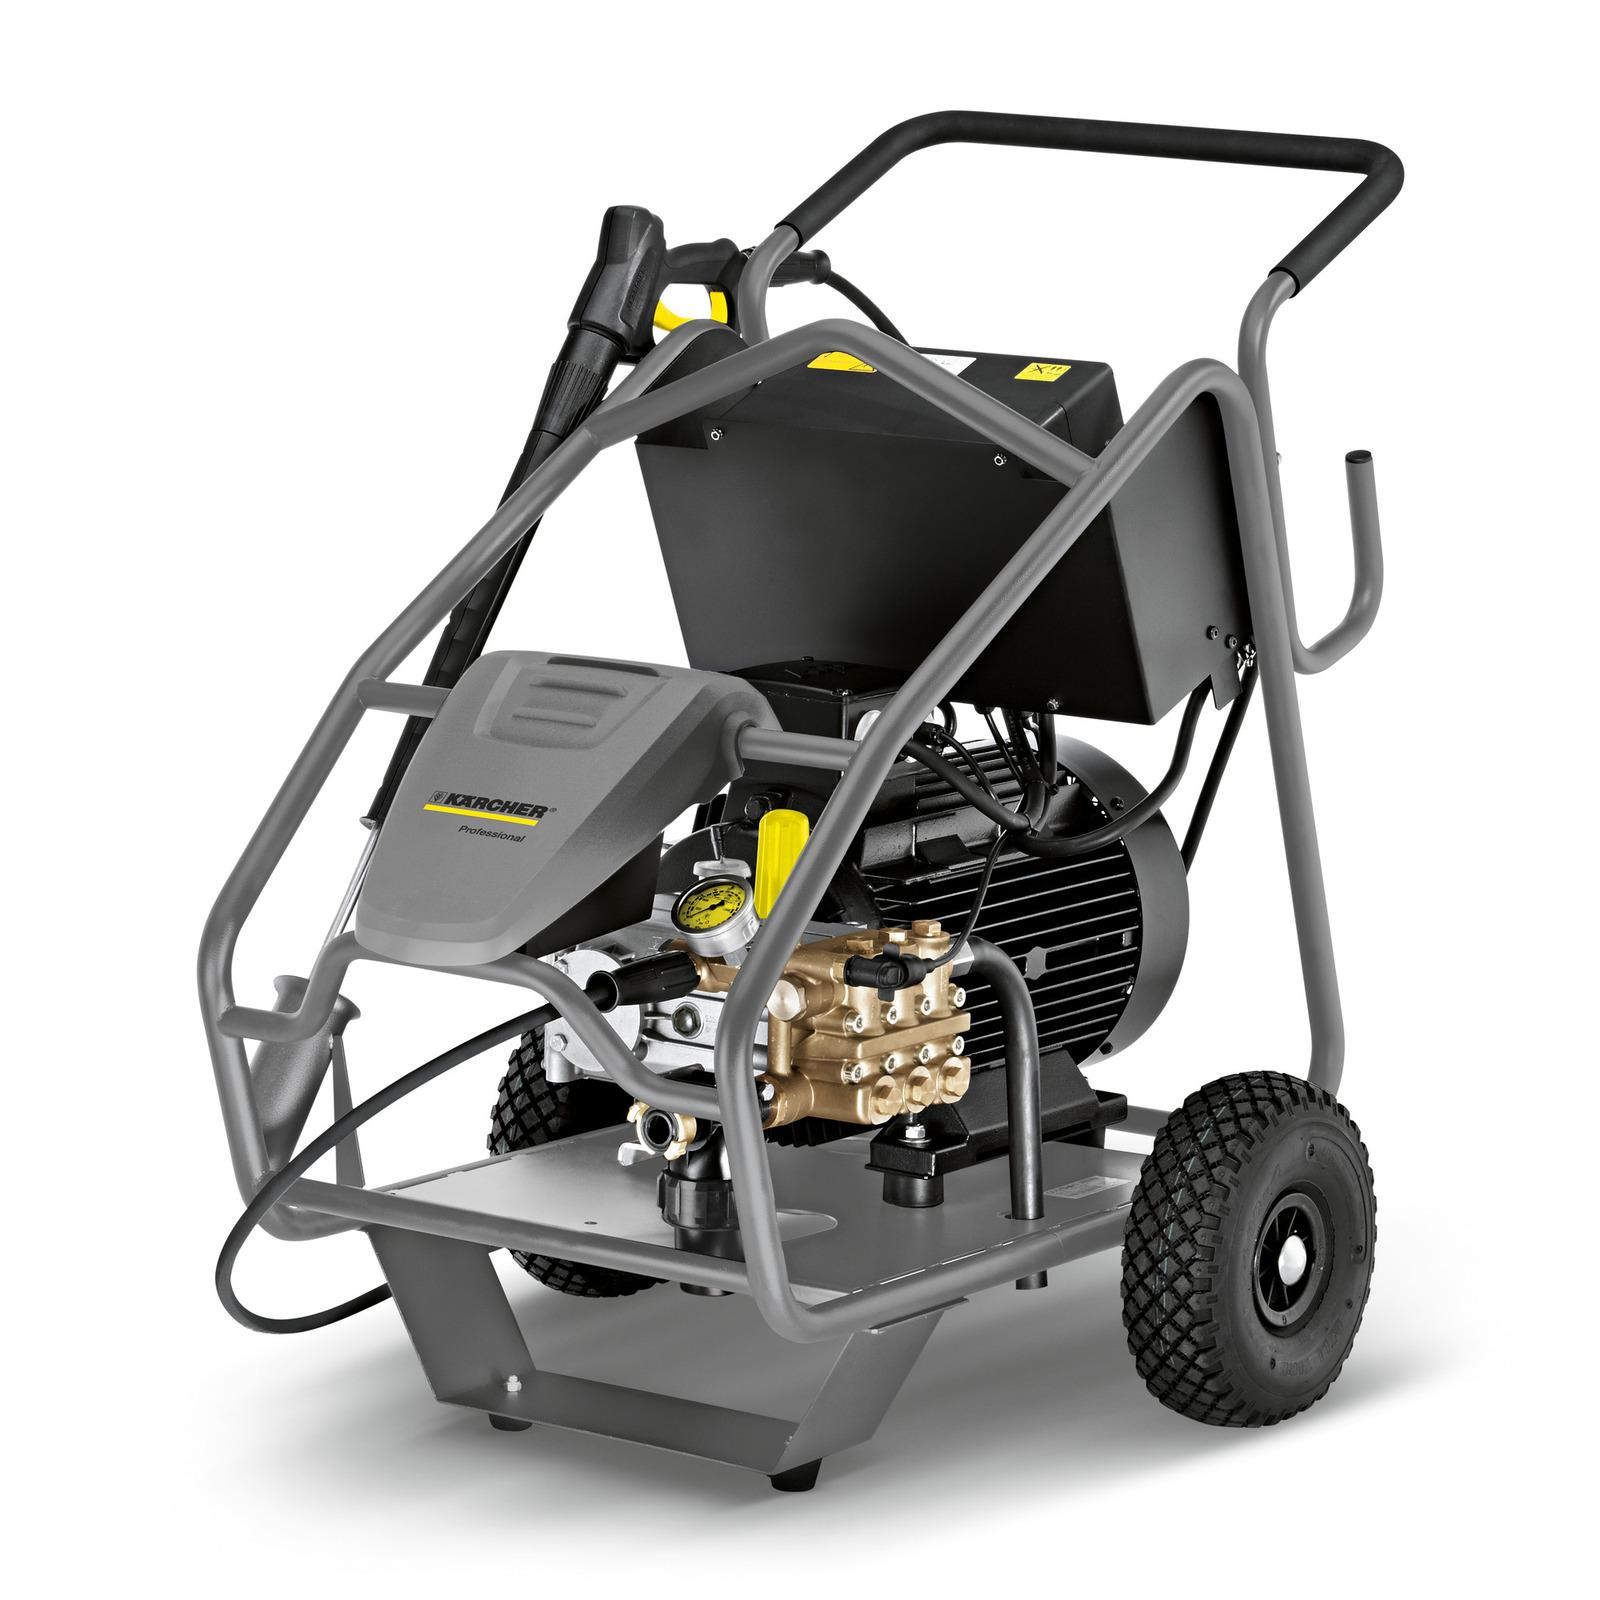 Ultra High Pressure Cleaner Hd 9 50 4 Cage K 228 Rcher